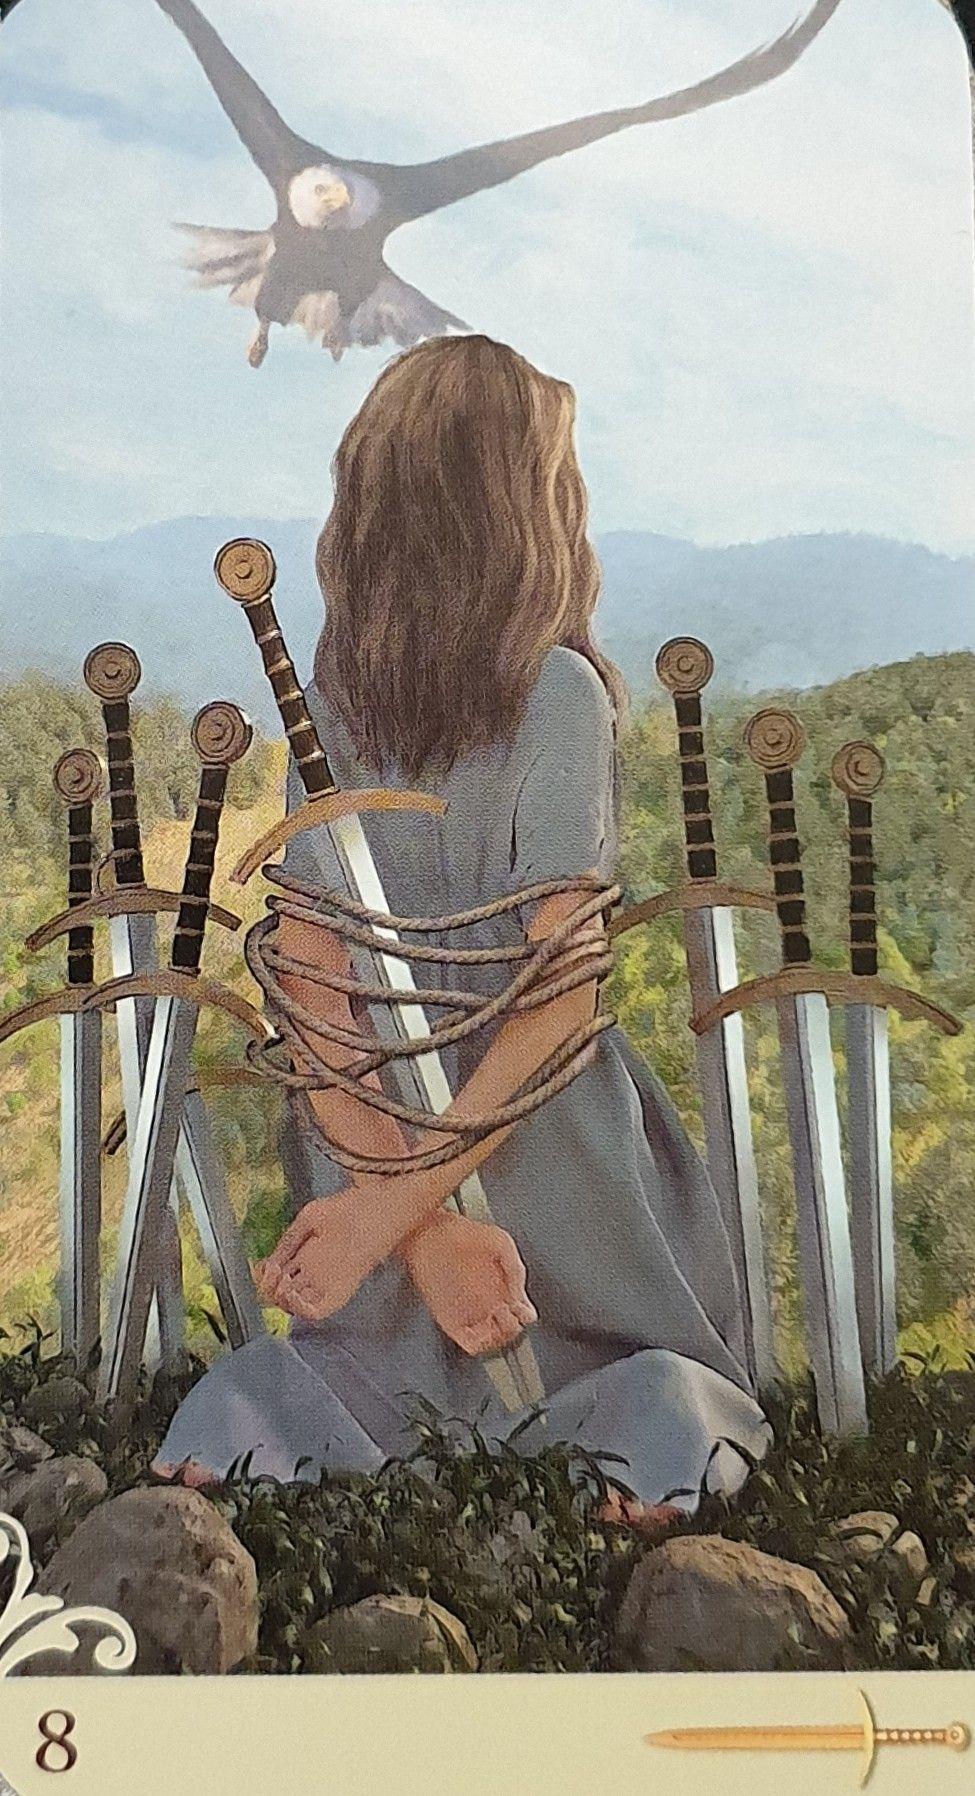 Vice-versa - Eight of Swords   Tarot in 2019   Tarot, Tarot